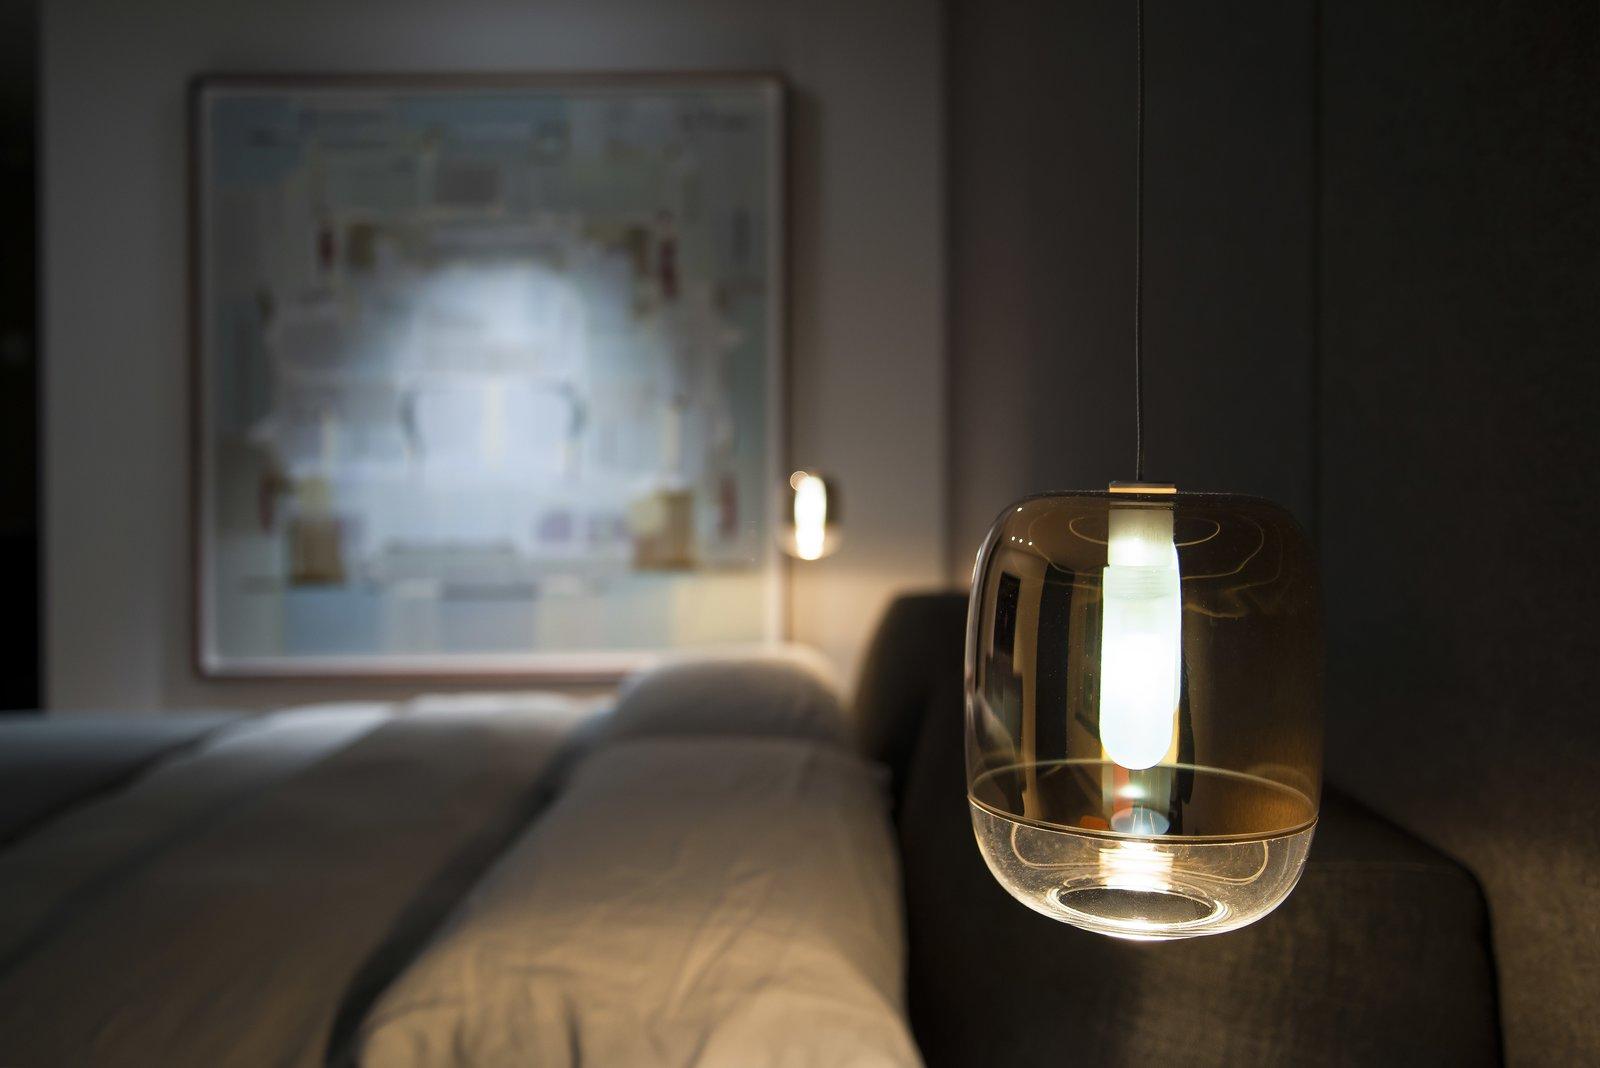 Master Bedroom - Reading Light  Nob Hill Residence by Imbue Design